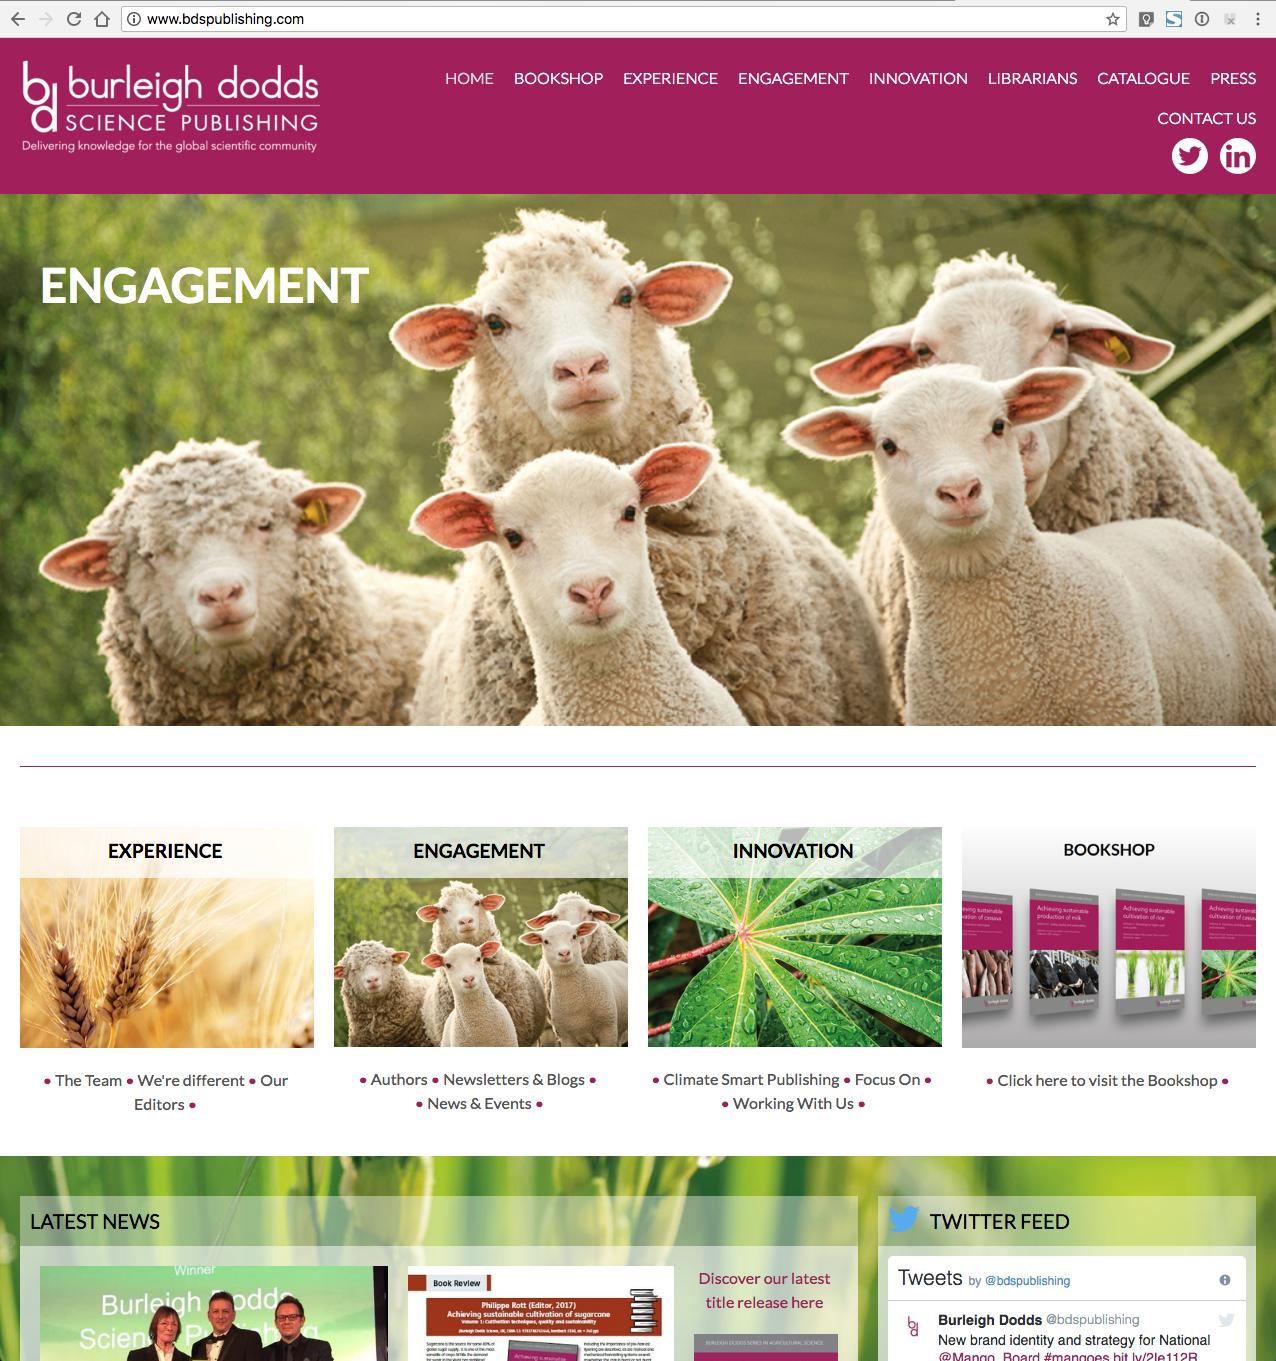 Burleigh Dodds website